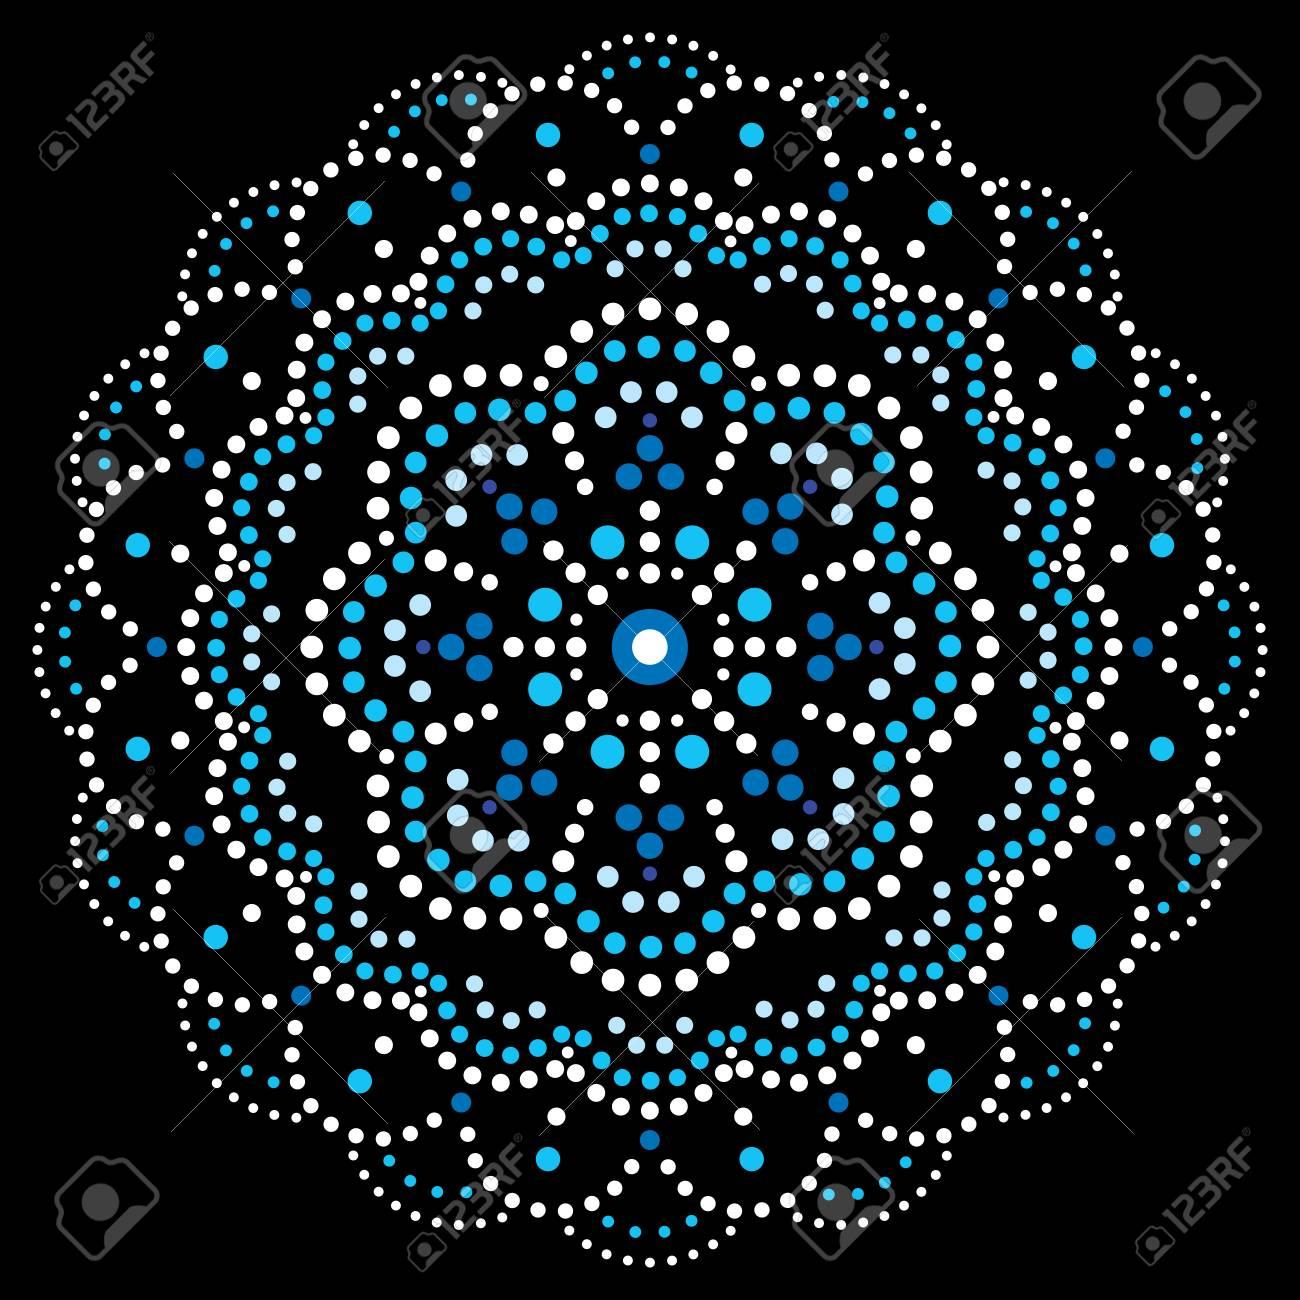 Mandala bohemian vector dot painting design, Aboriginal traditional decorative pattern, Australian mosaic art - 123172693